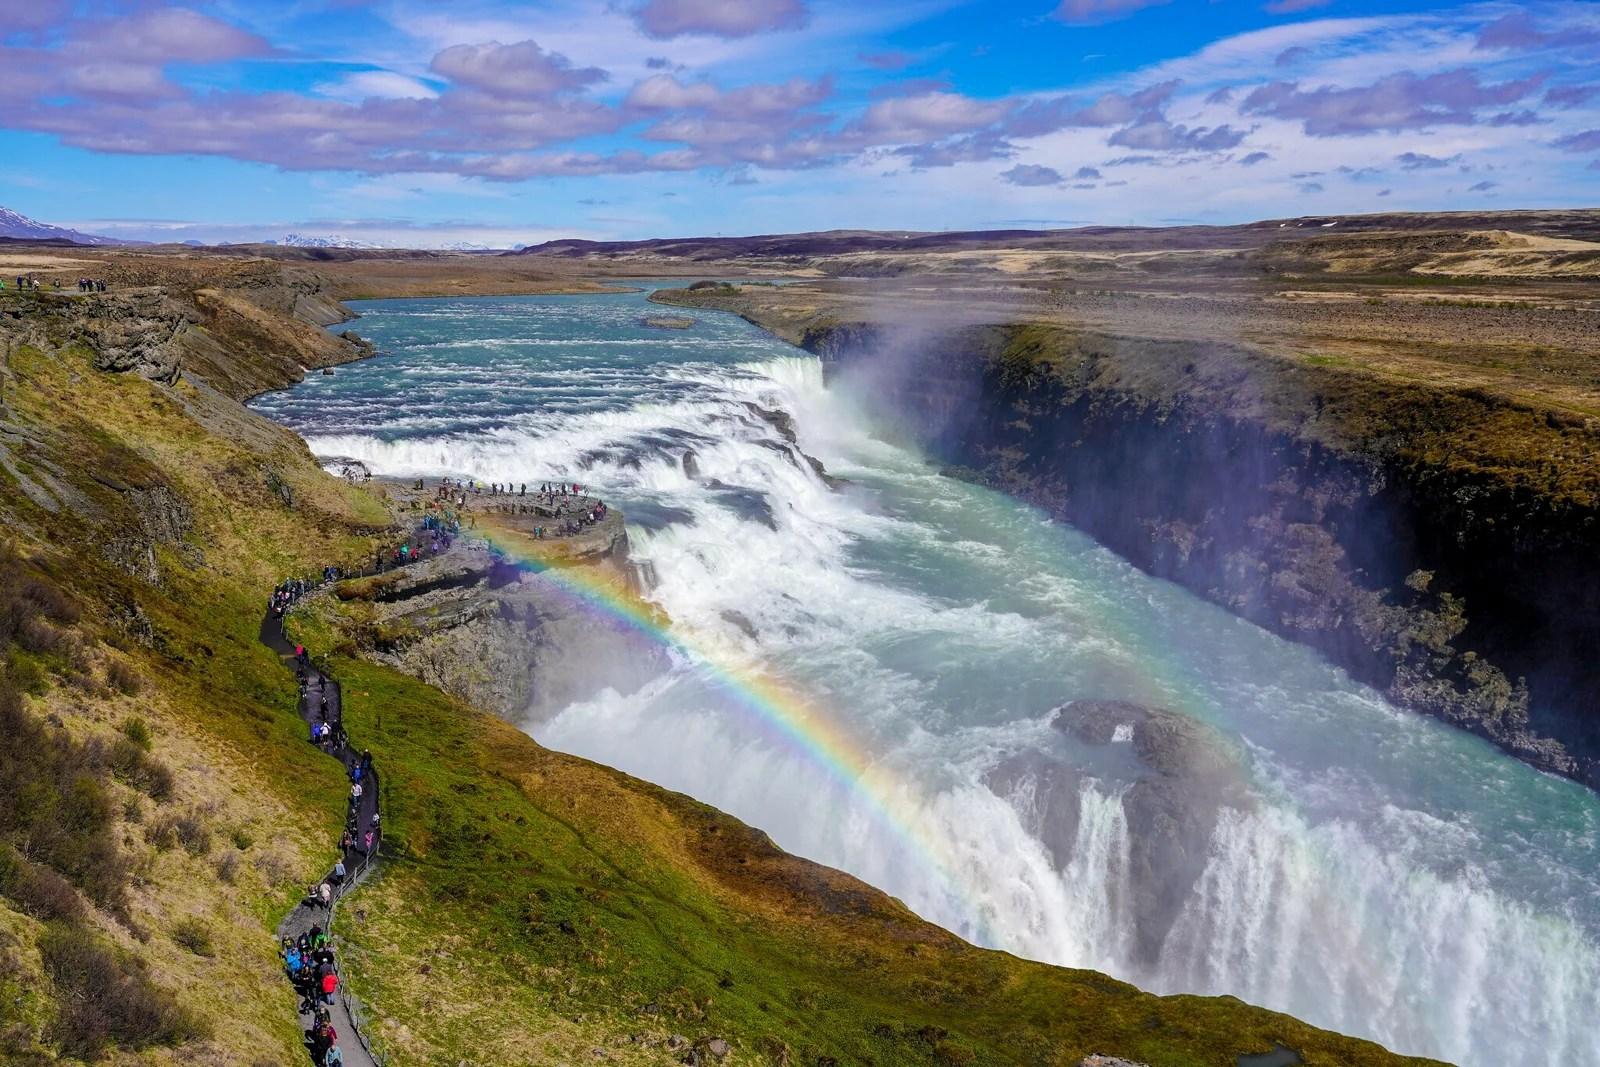 Deal Alert: Flights to Iceland From $323 Round-Trip